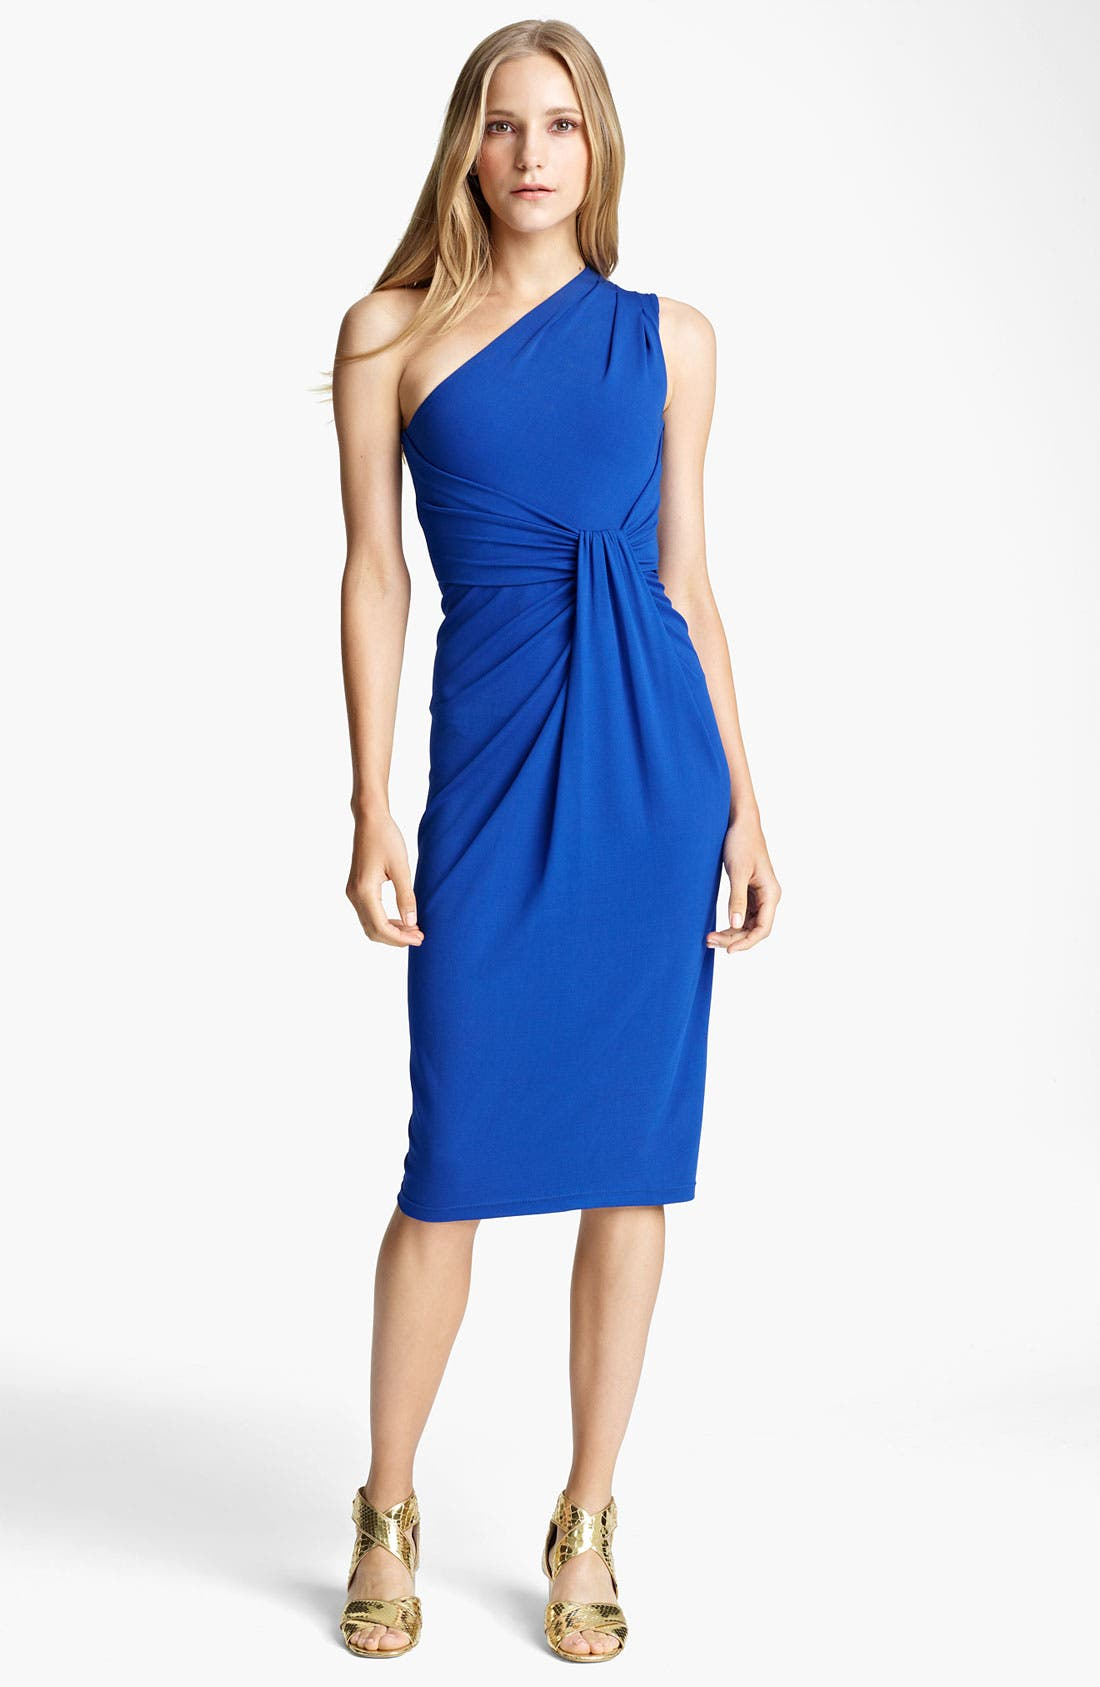 Alternate Image 1 Selected - Michael Kors One Shoulder Matte Jersey Sheath Dress